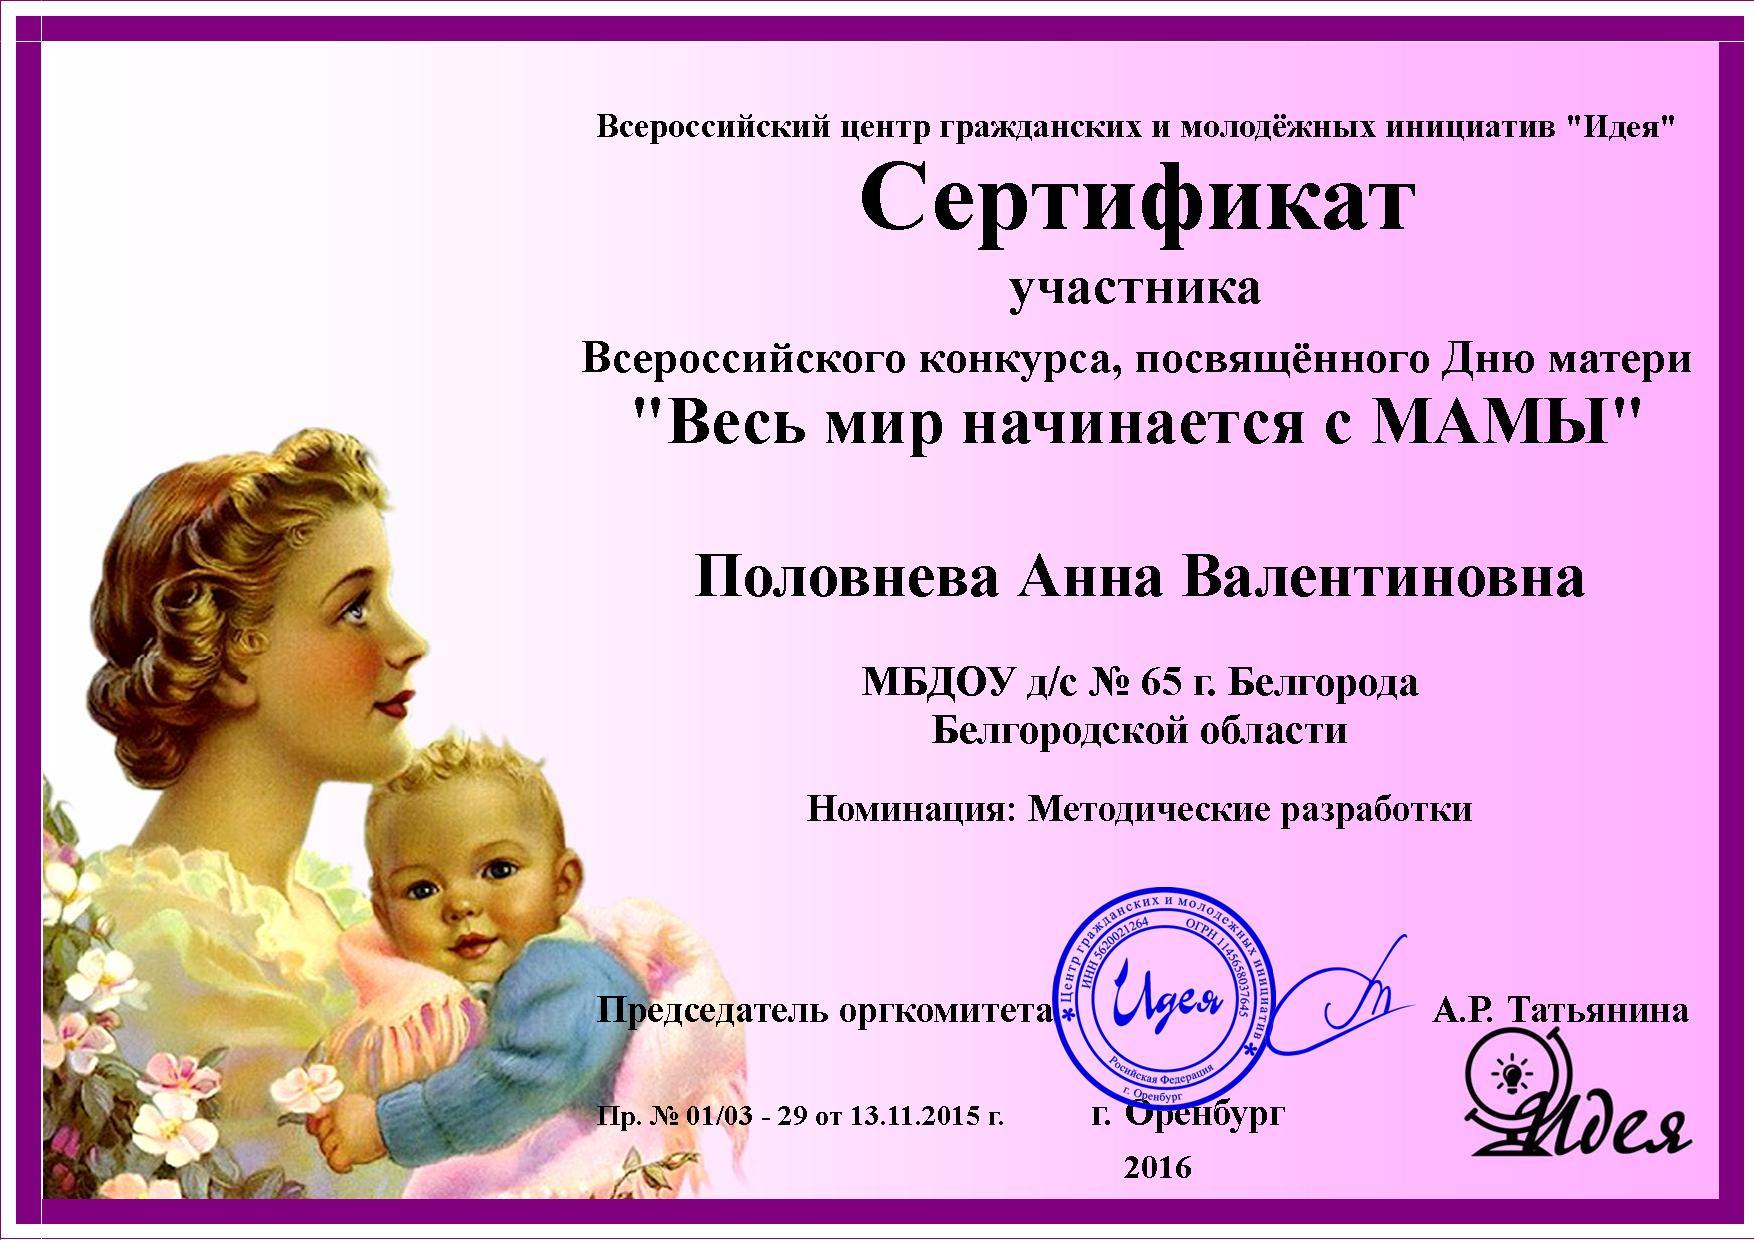 Сертификат-31058-Половнева Анна Валентиновна